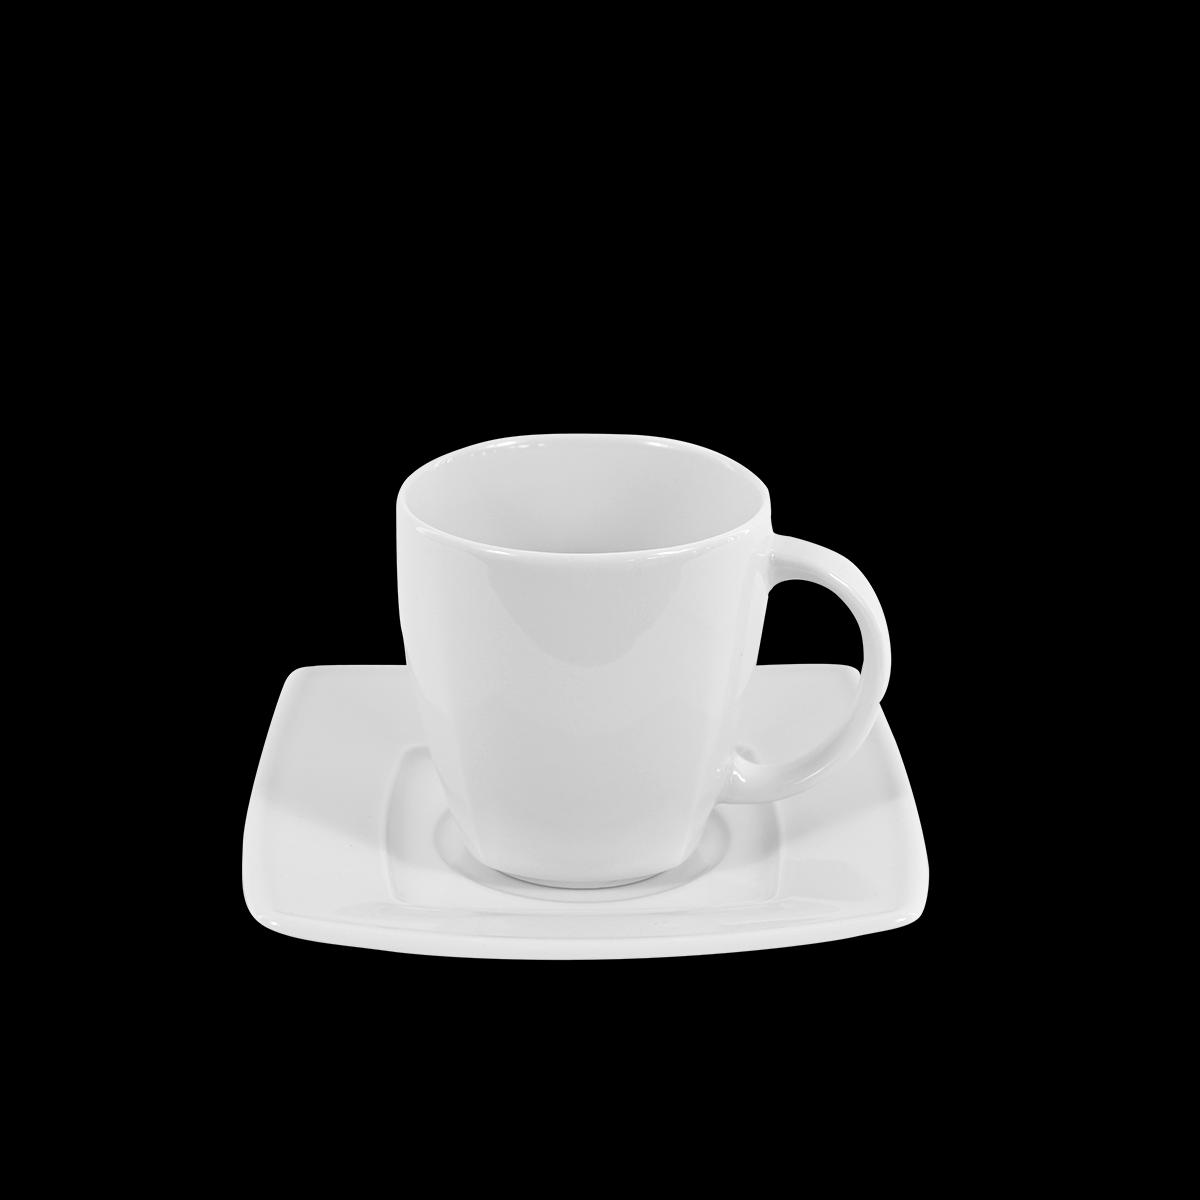 Kaffeetasse Ambrassador, weiß, 150 ml